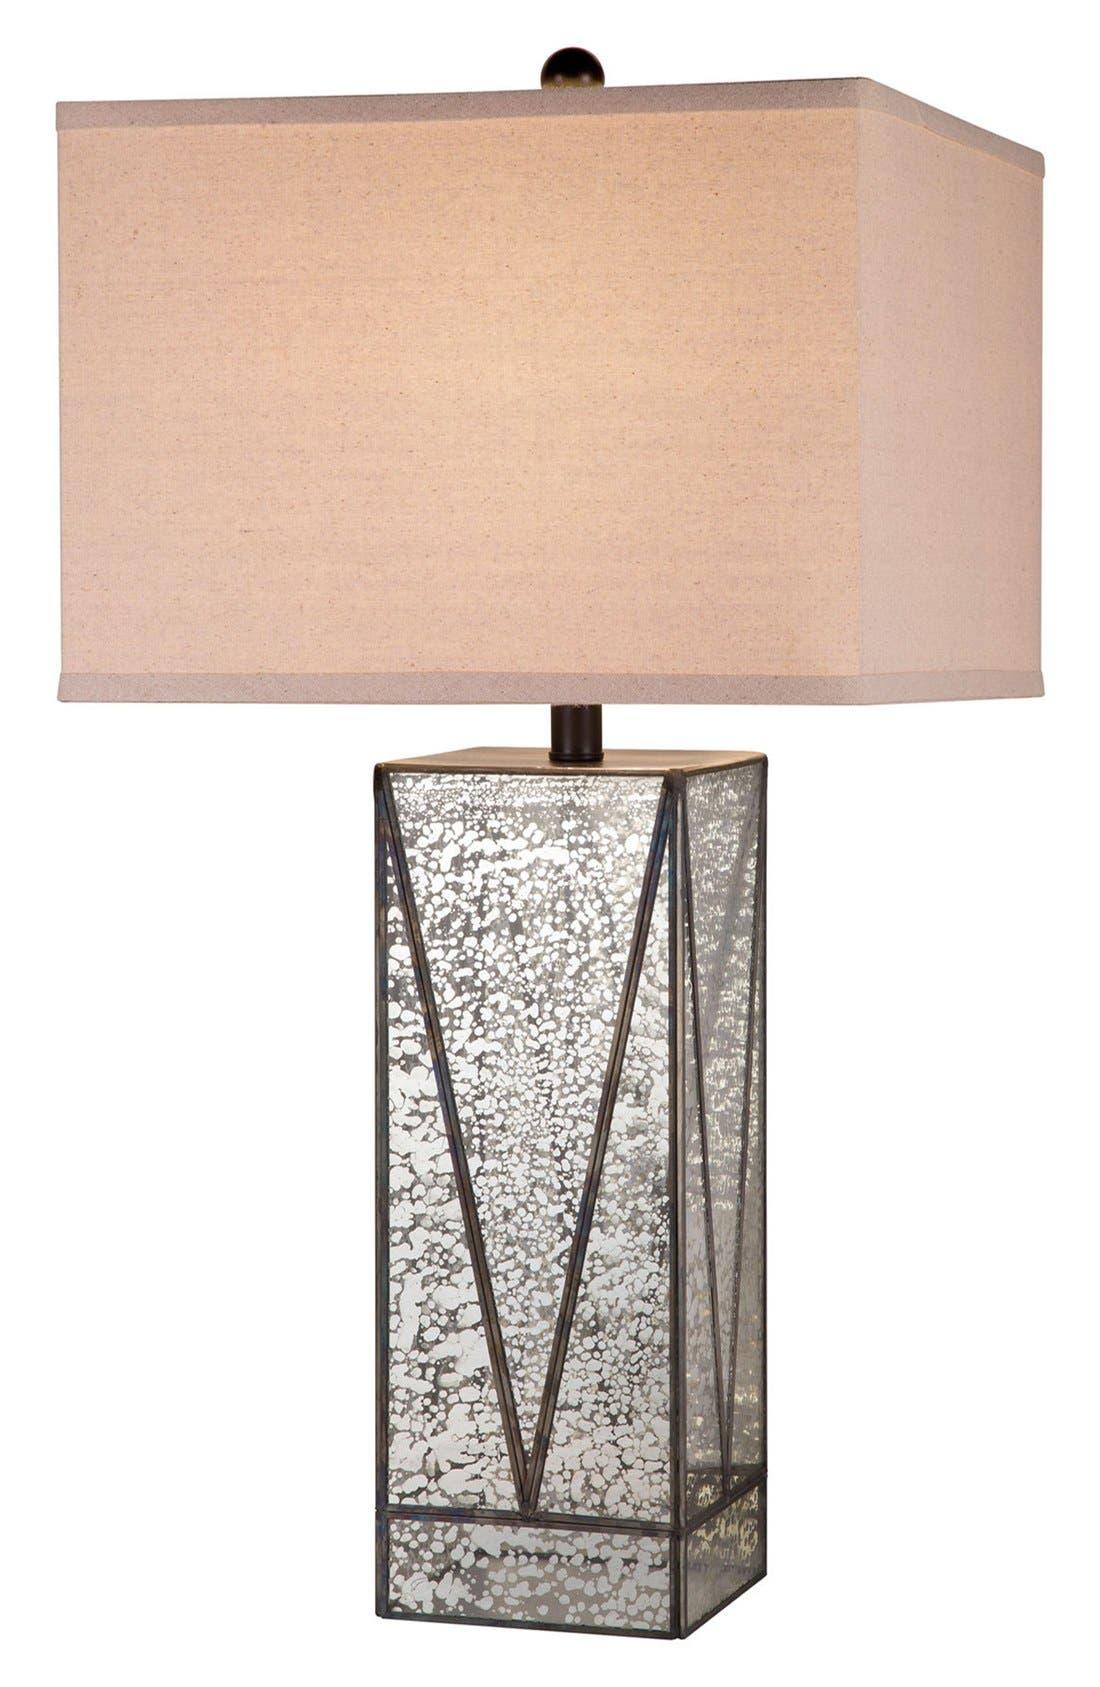 JAlexander Mercury Glass Table Lamp,                         Main,                         color, Silver/ Black